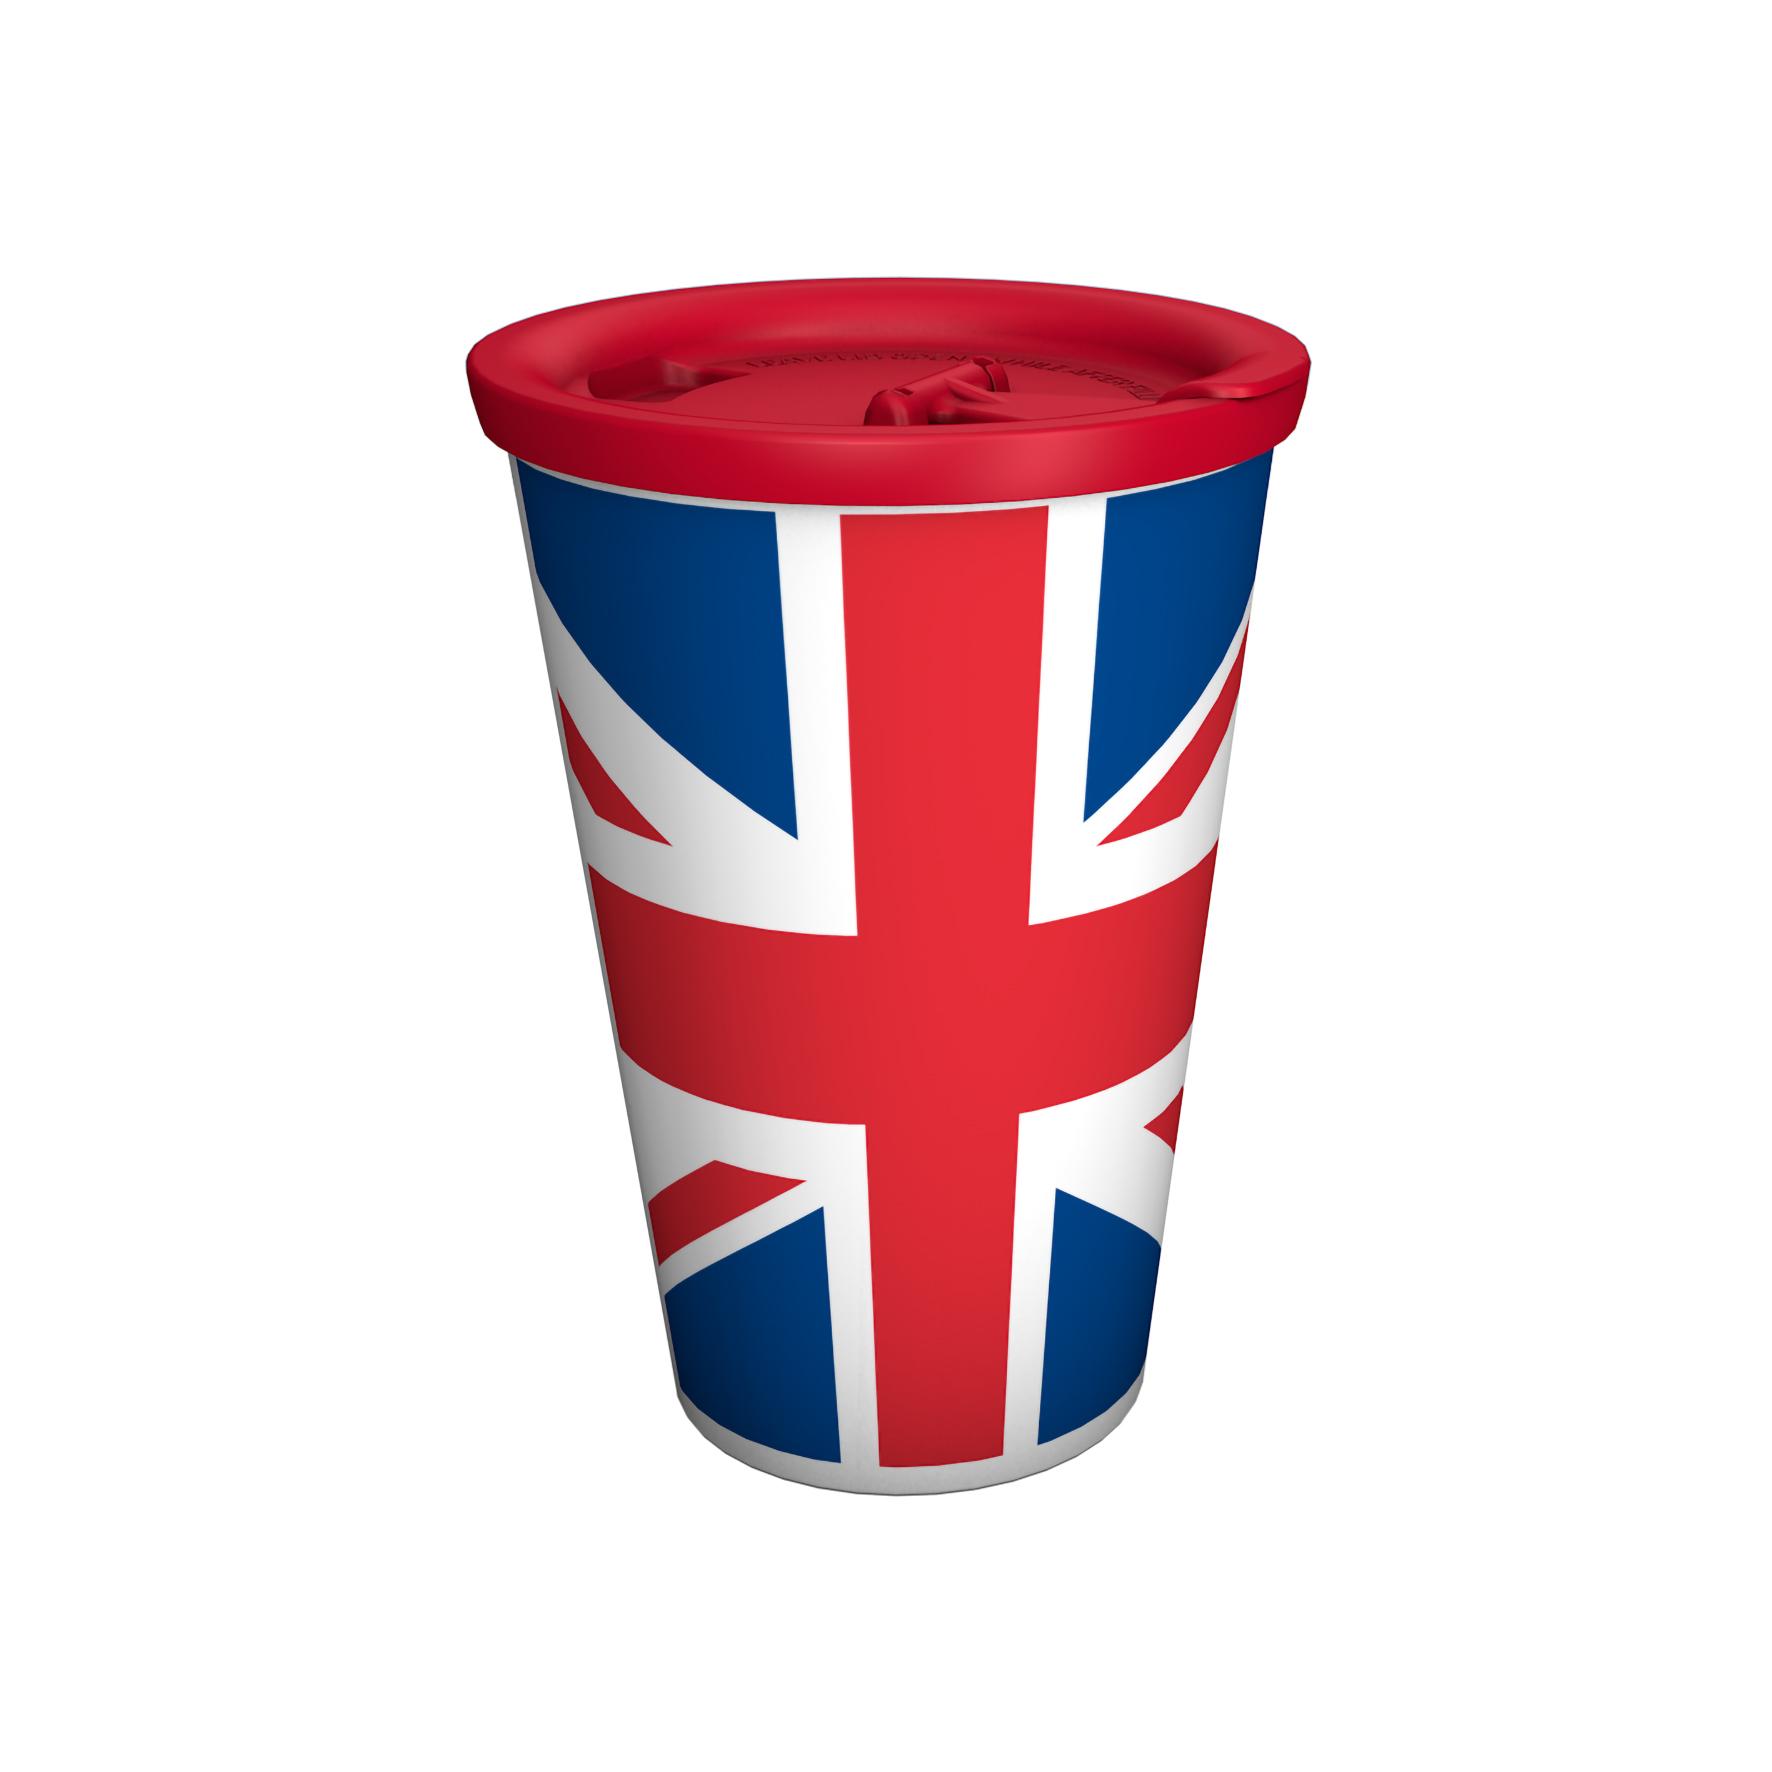 Coffee to go-Mug Country-Edition with lid